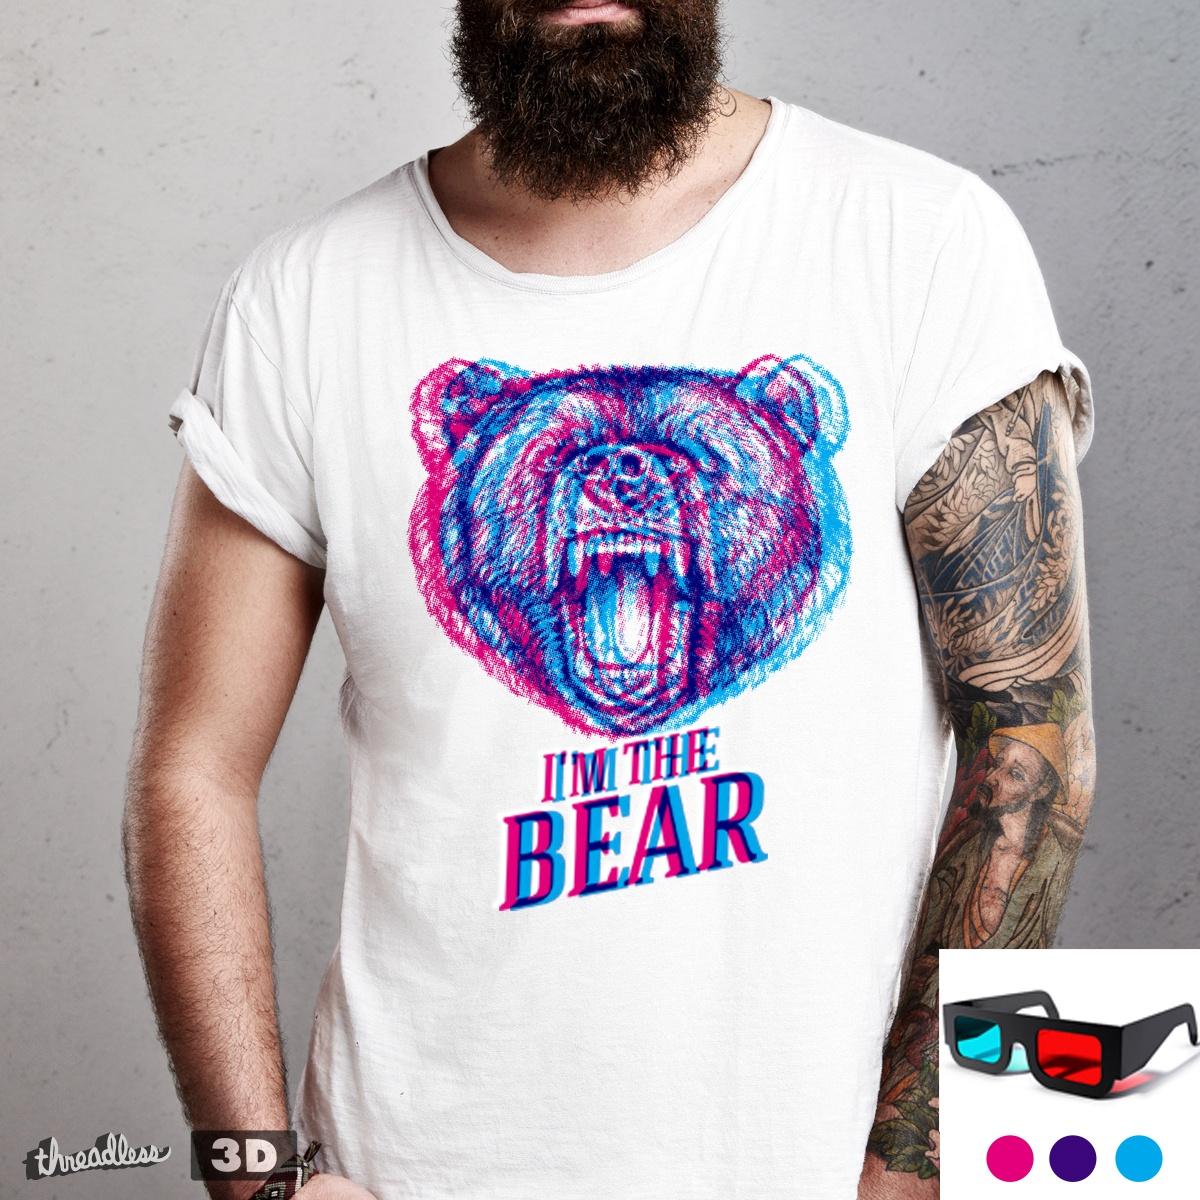 I'M THE BEAR by javierv007 on Threadless